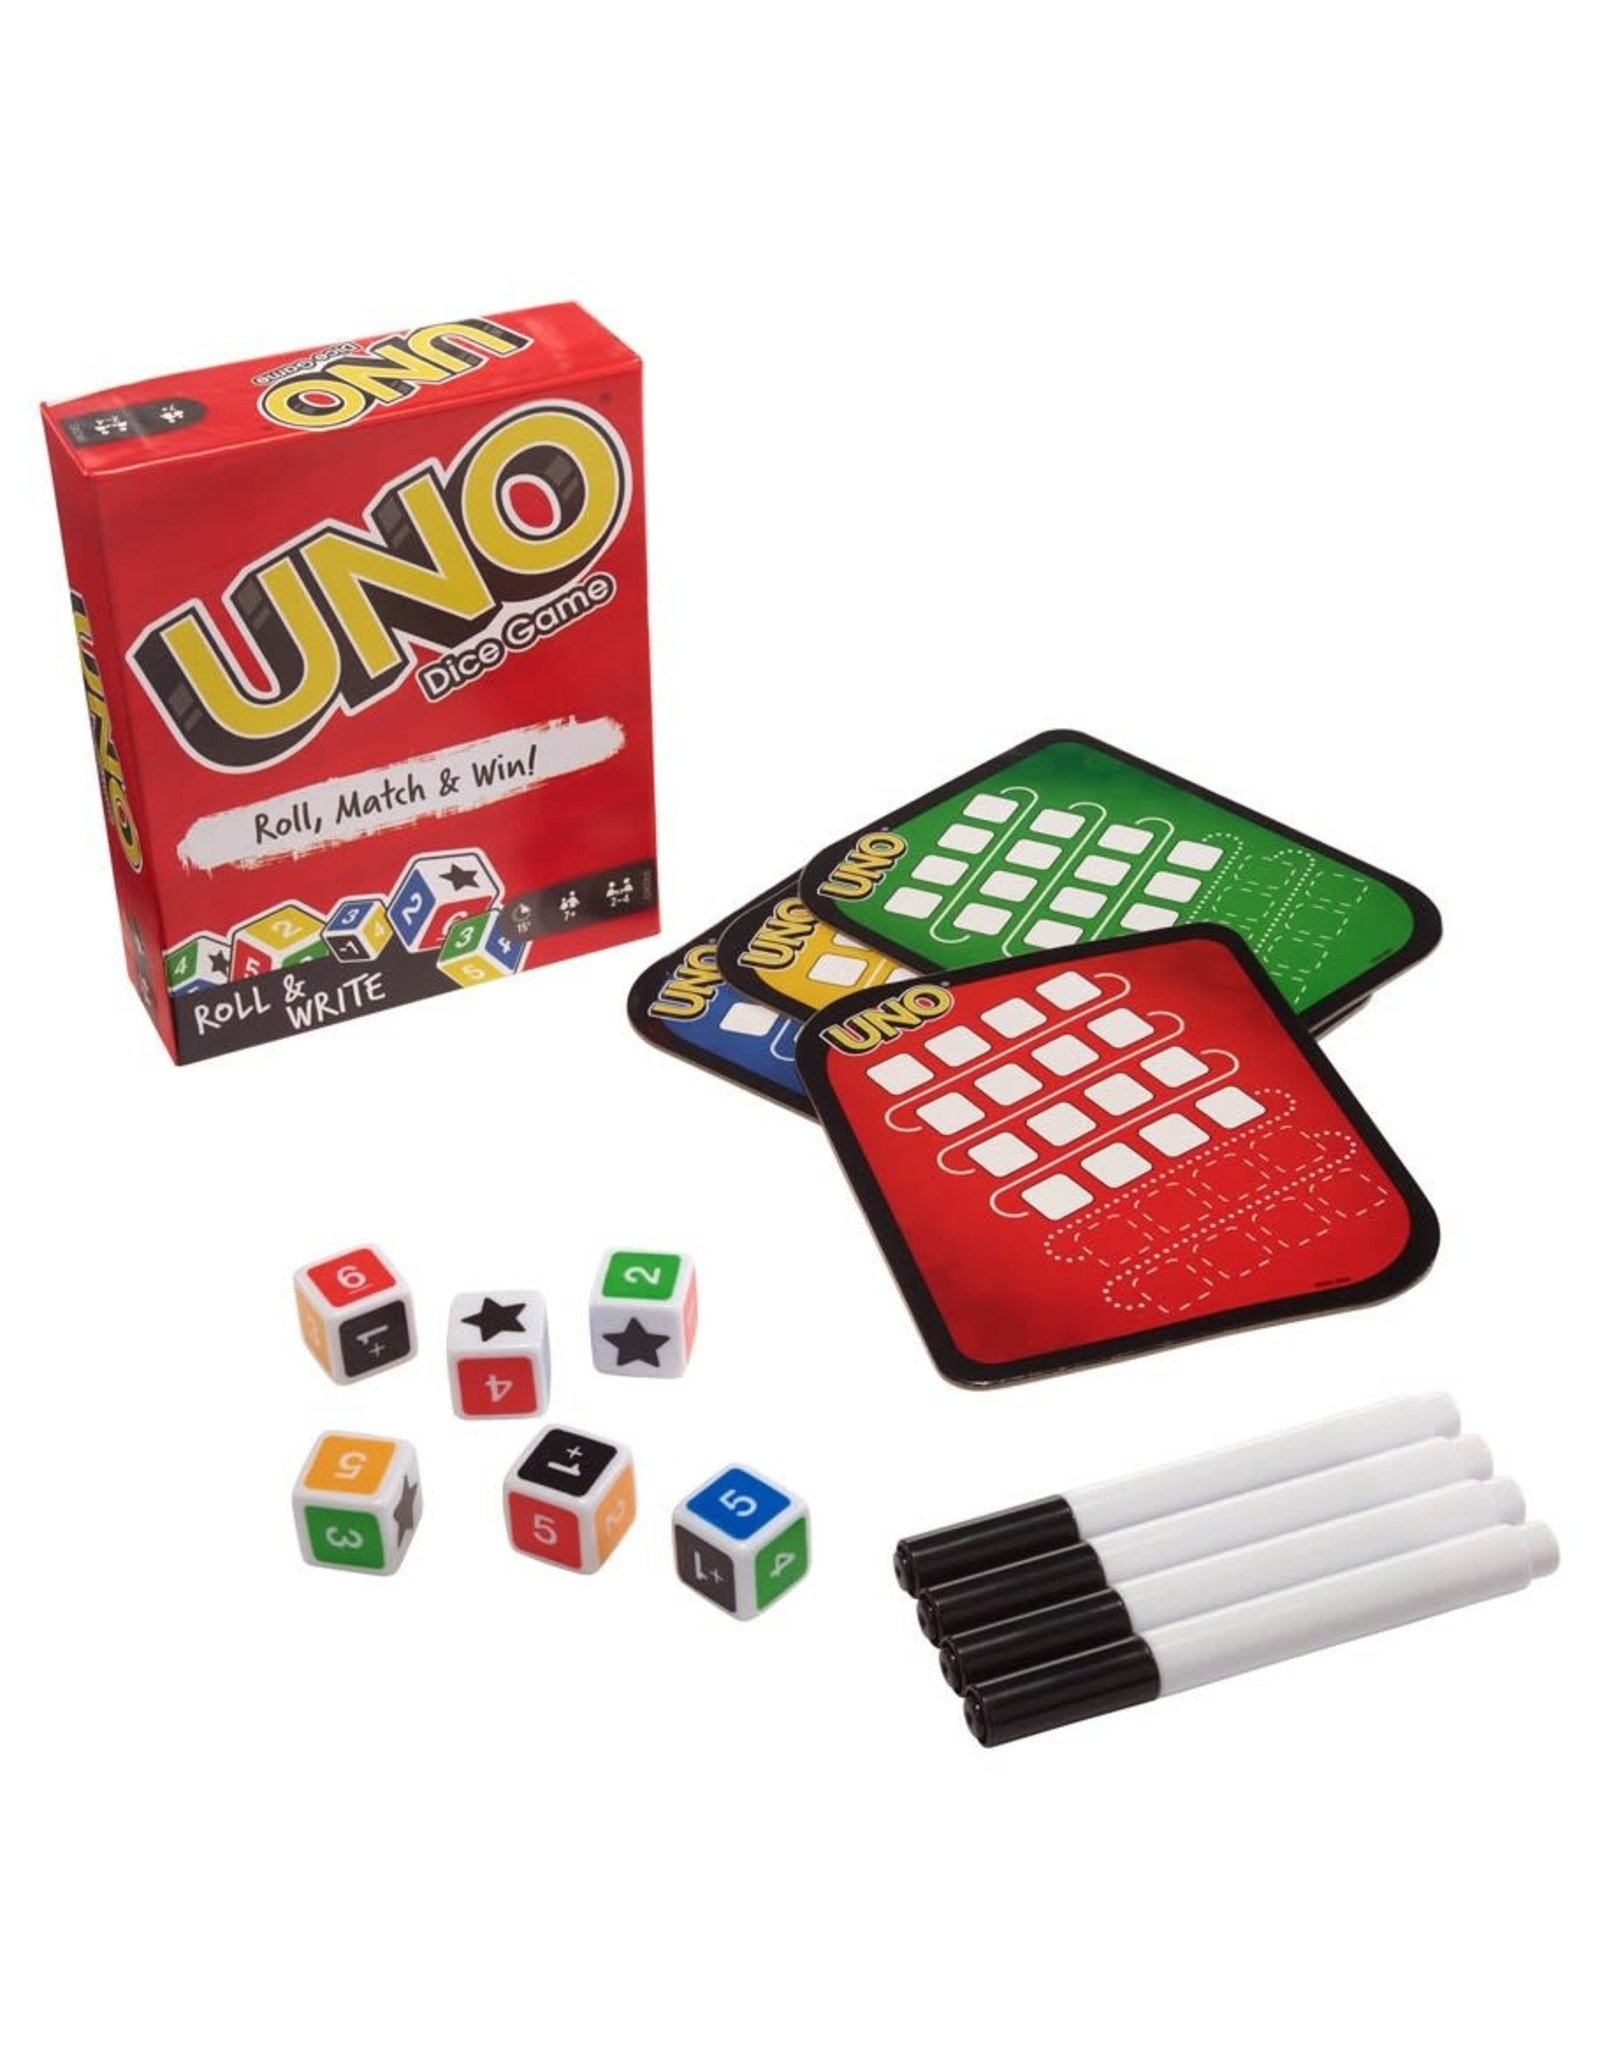 Mattel Games UNO: Roll &Write Dice Game